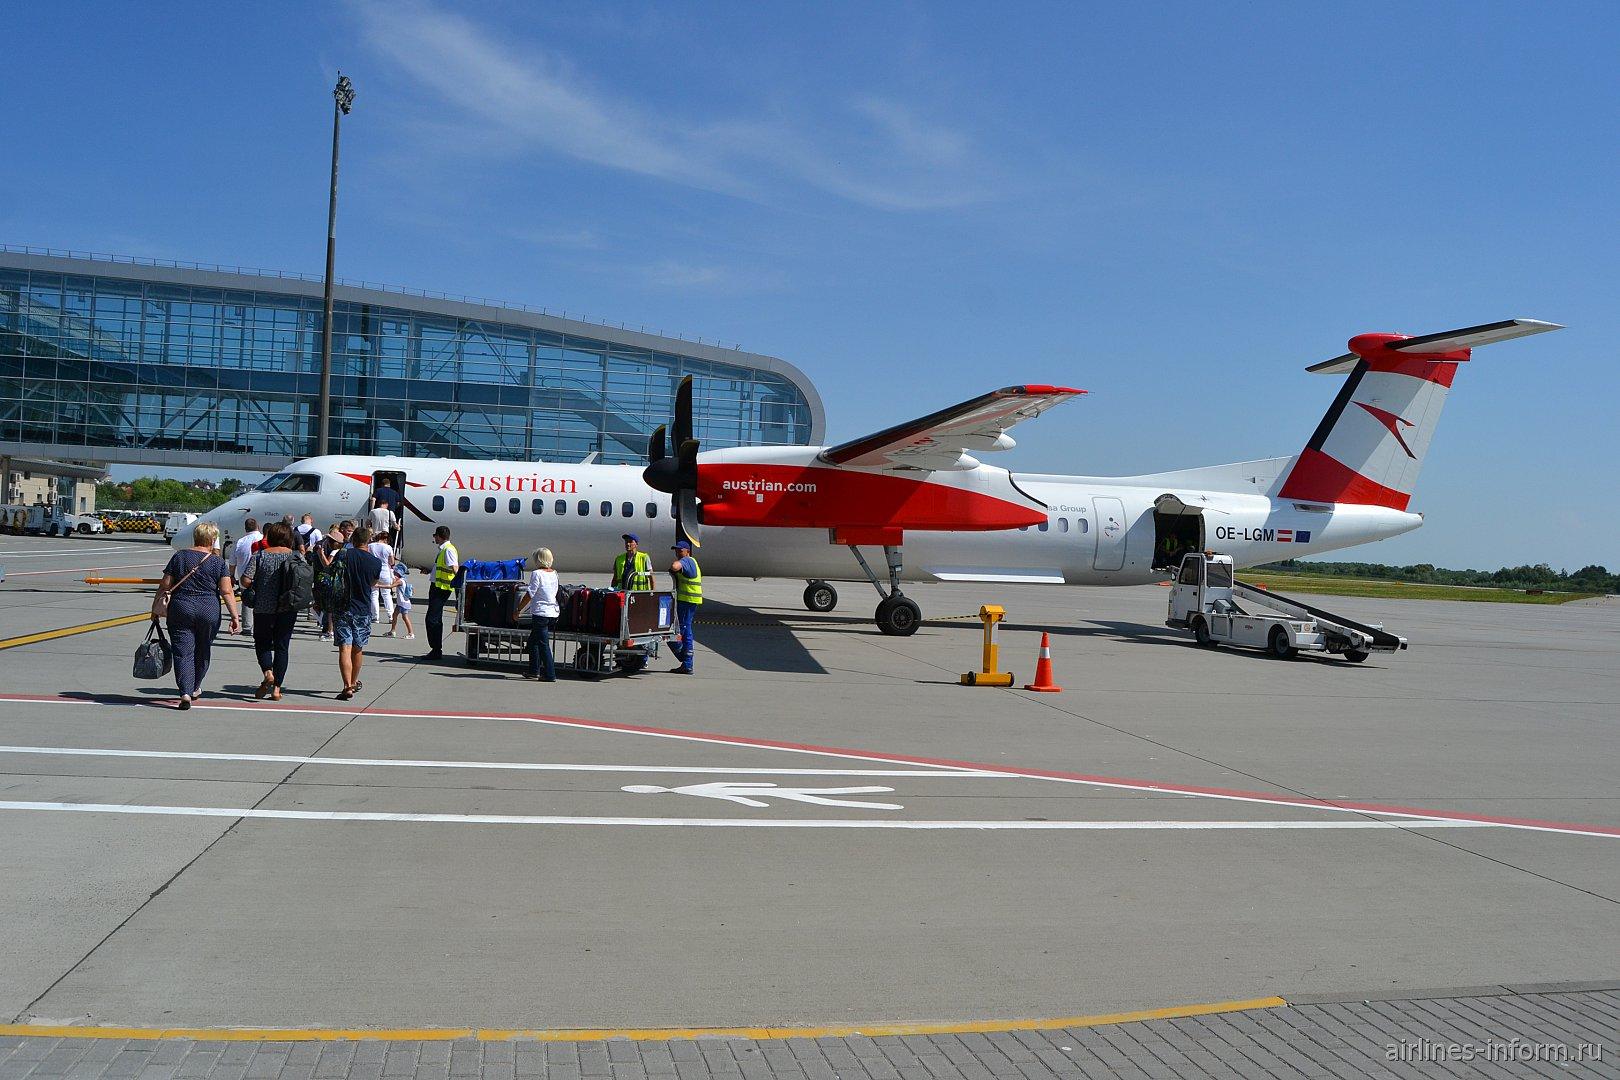 Уикенд в Европе. Львов (LWO) - Вена (VIE) Austrian Airlines. Успеть за 45 минут.